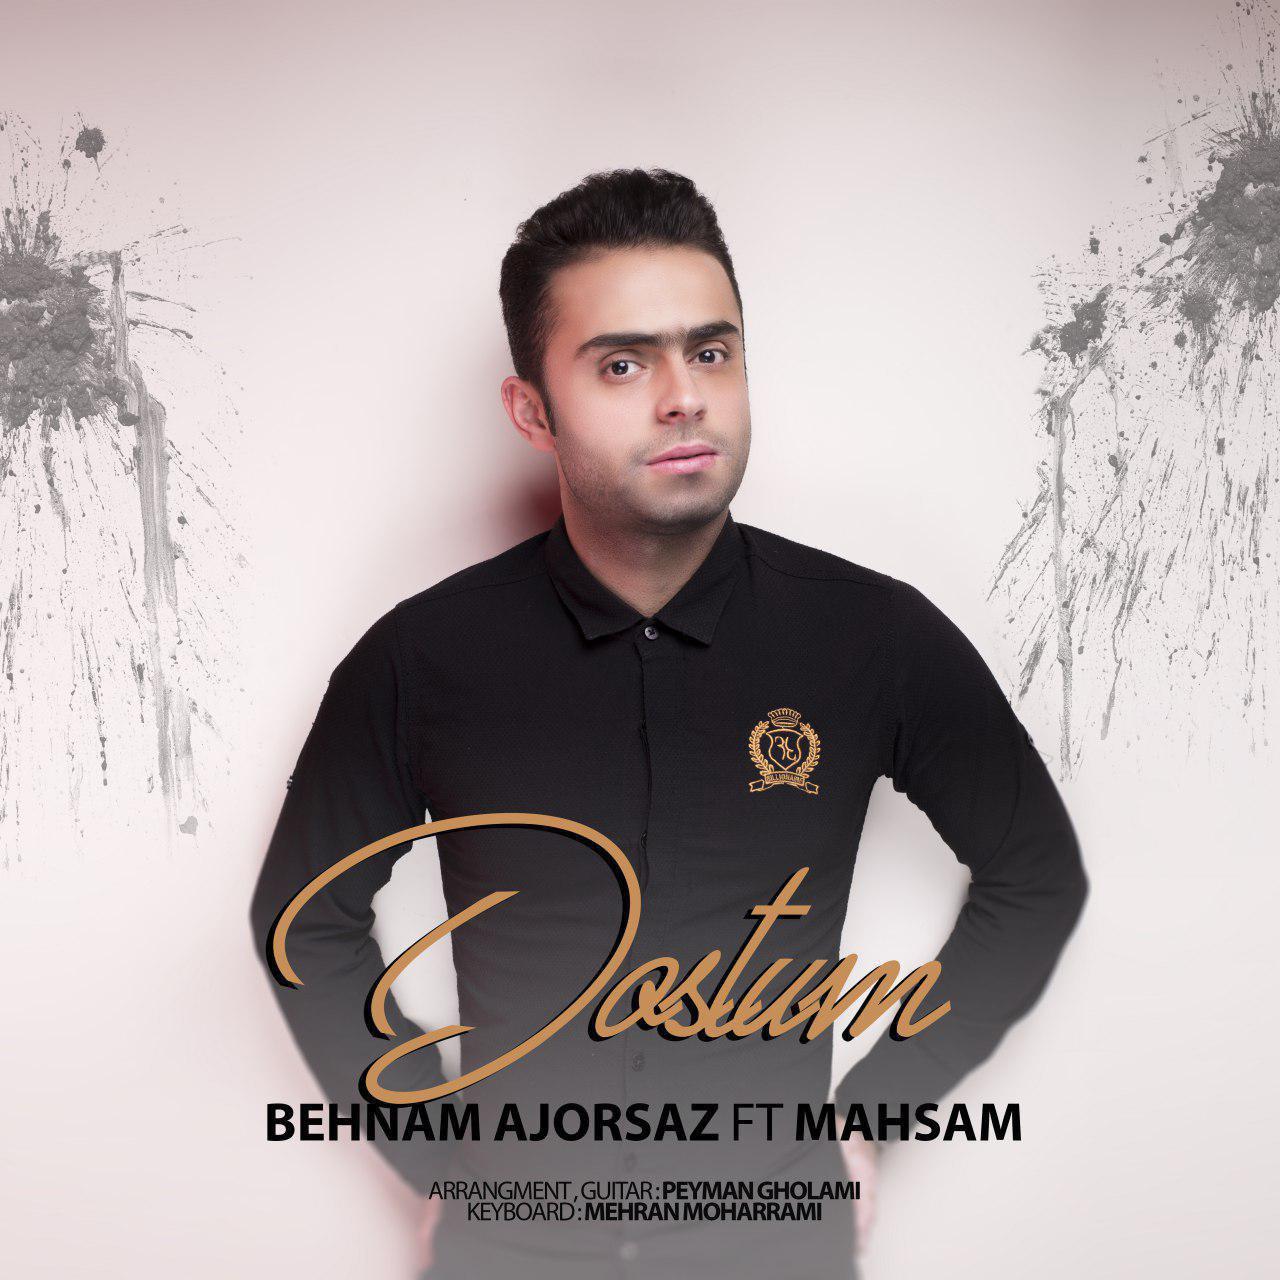 http://s8.picofile.com/file/8366266618/07Behnam_Ajorsaz_Feat_Mahsam_Dostum.jpg